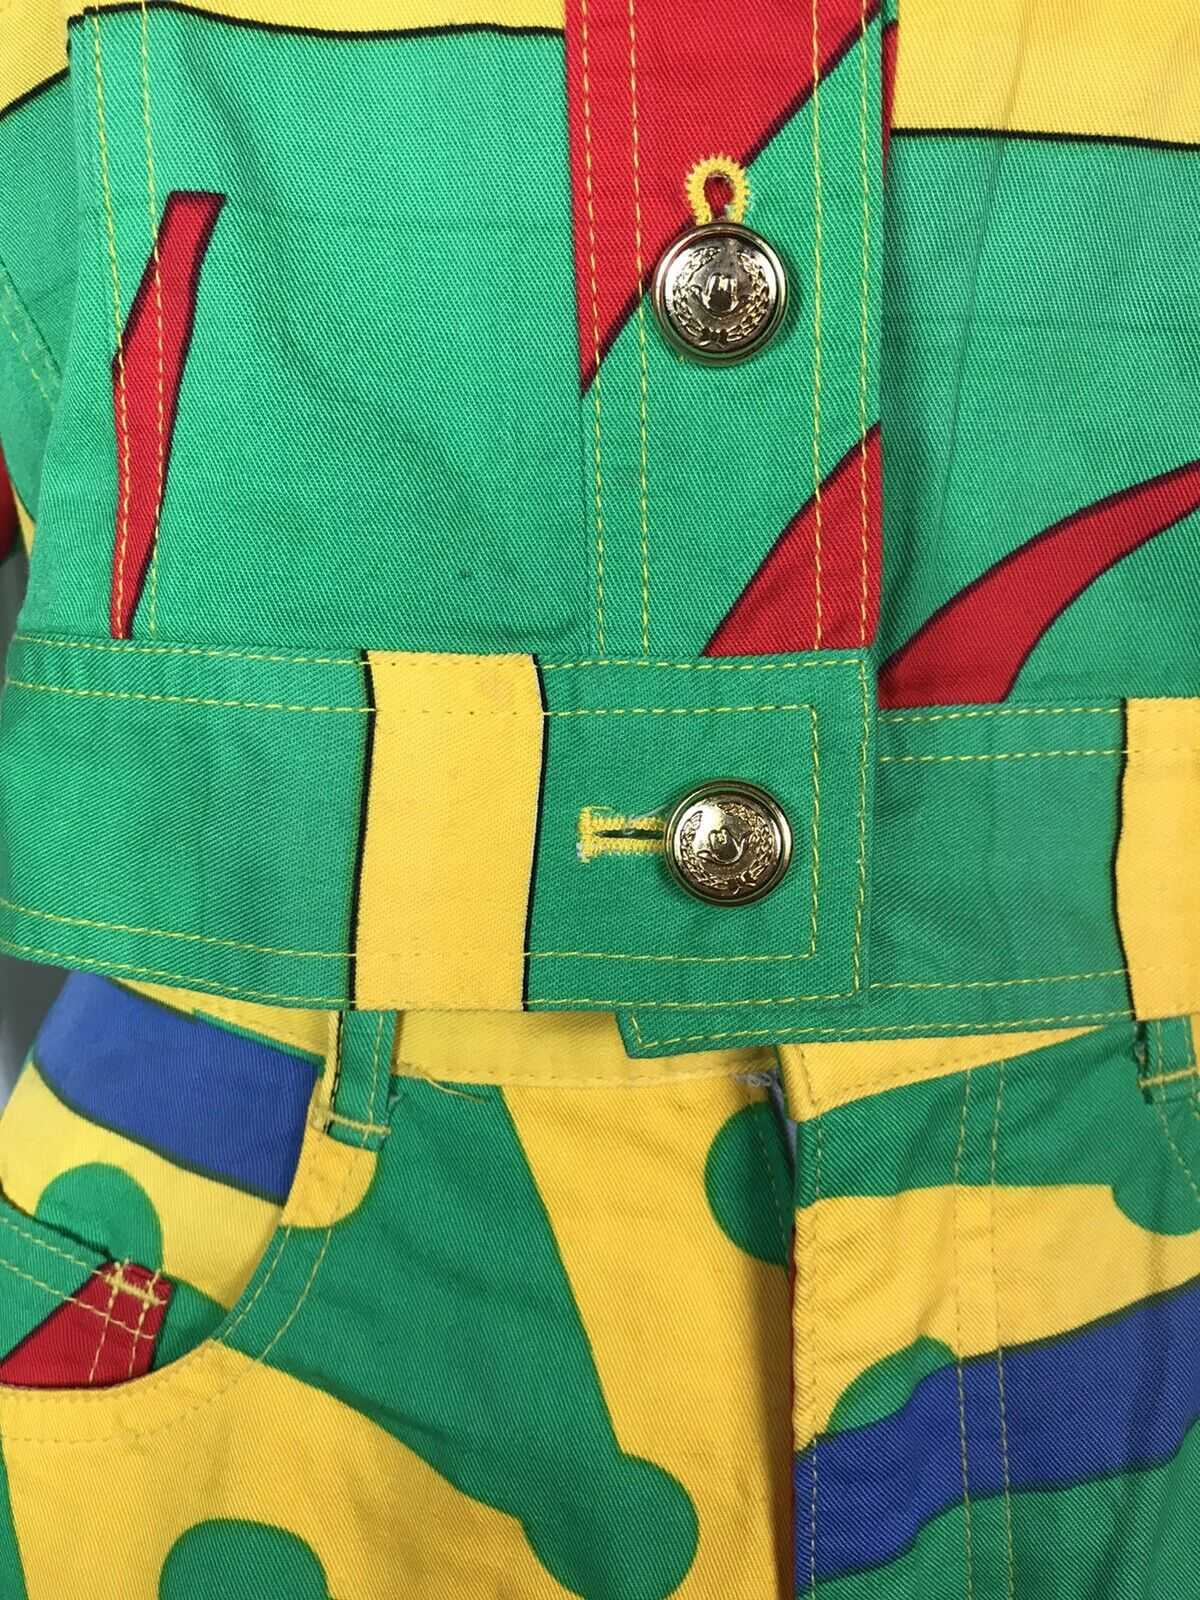 Rare Vtg Moschino Jeans 90s Green Jacket & Mini S… - image 7